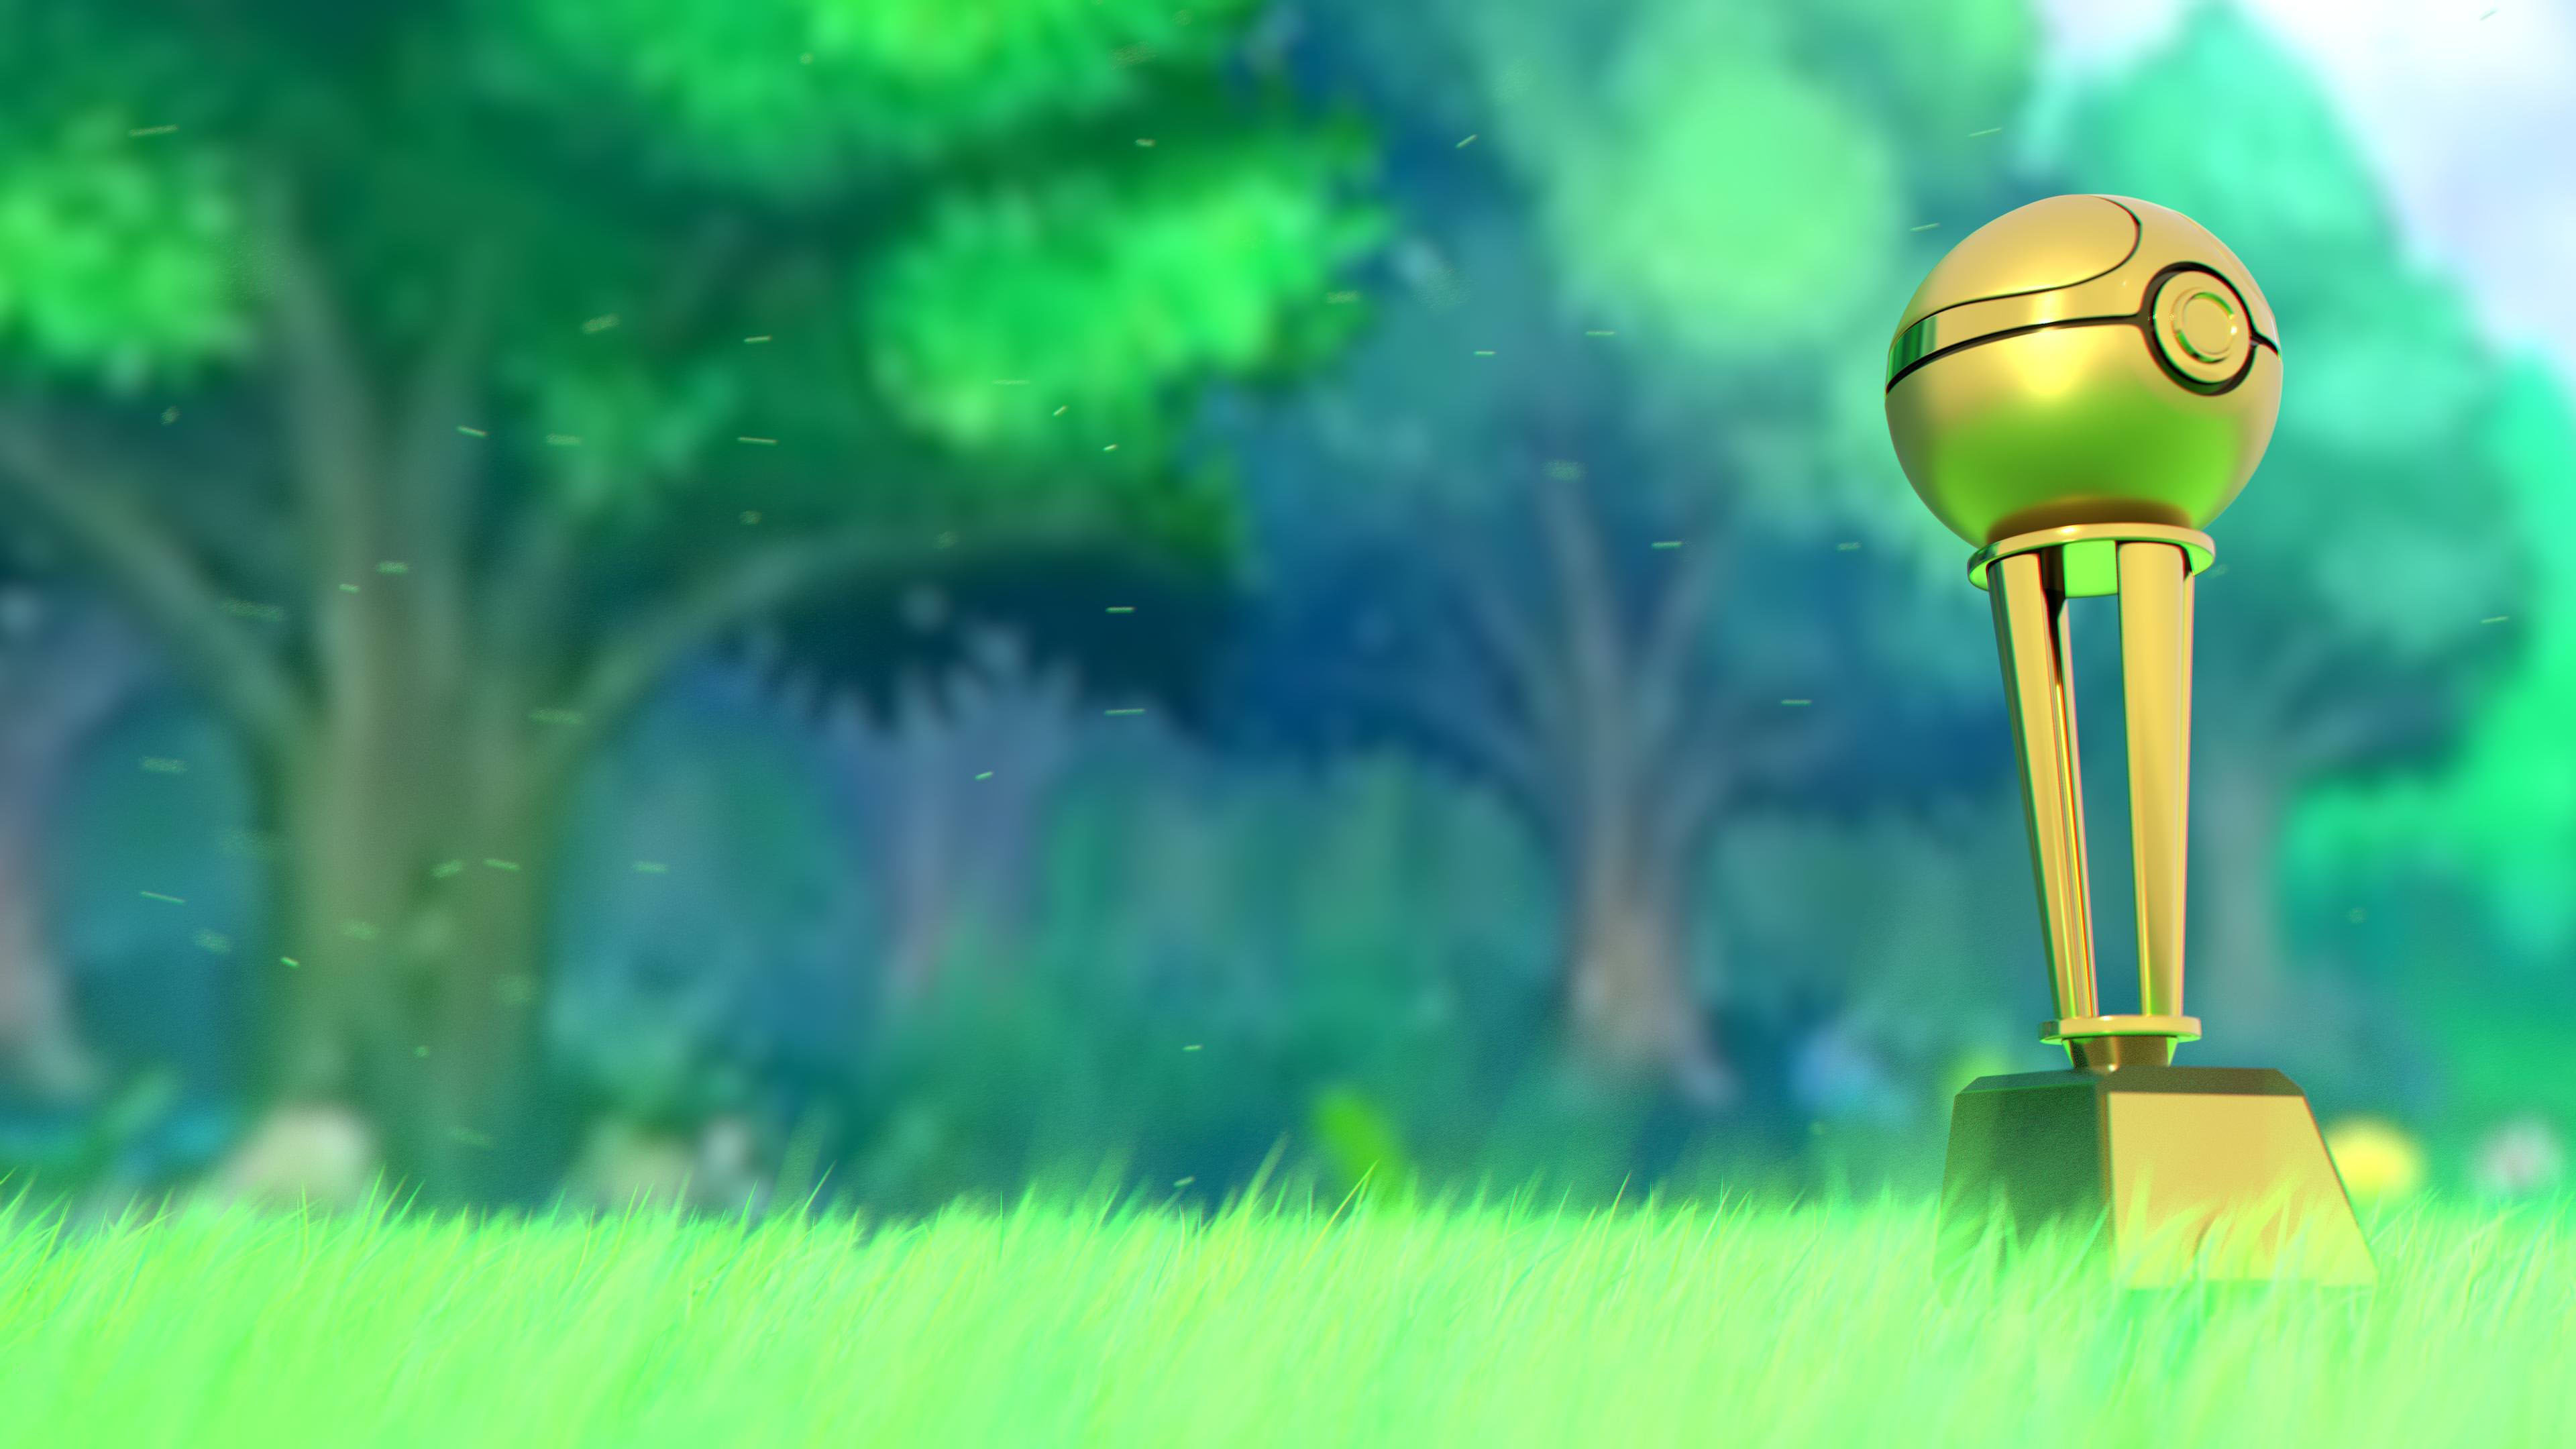 Hình nền pokemon 4K